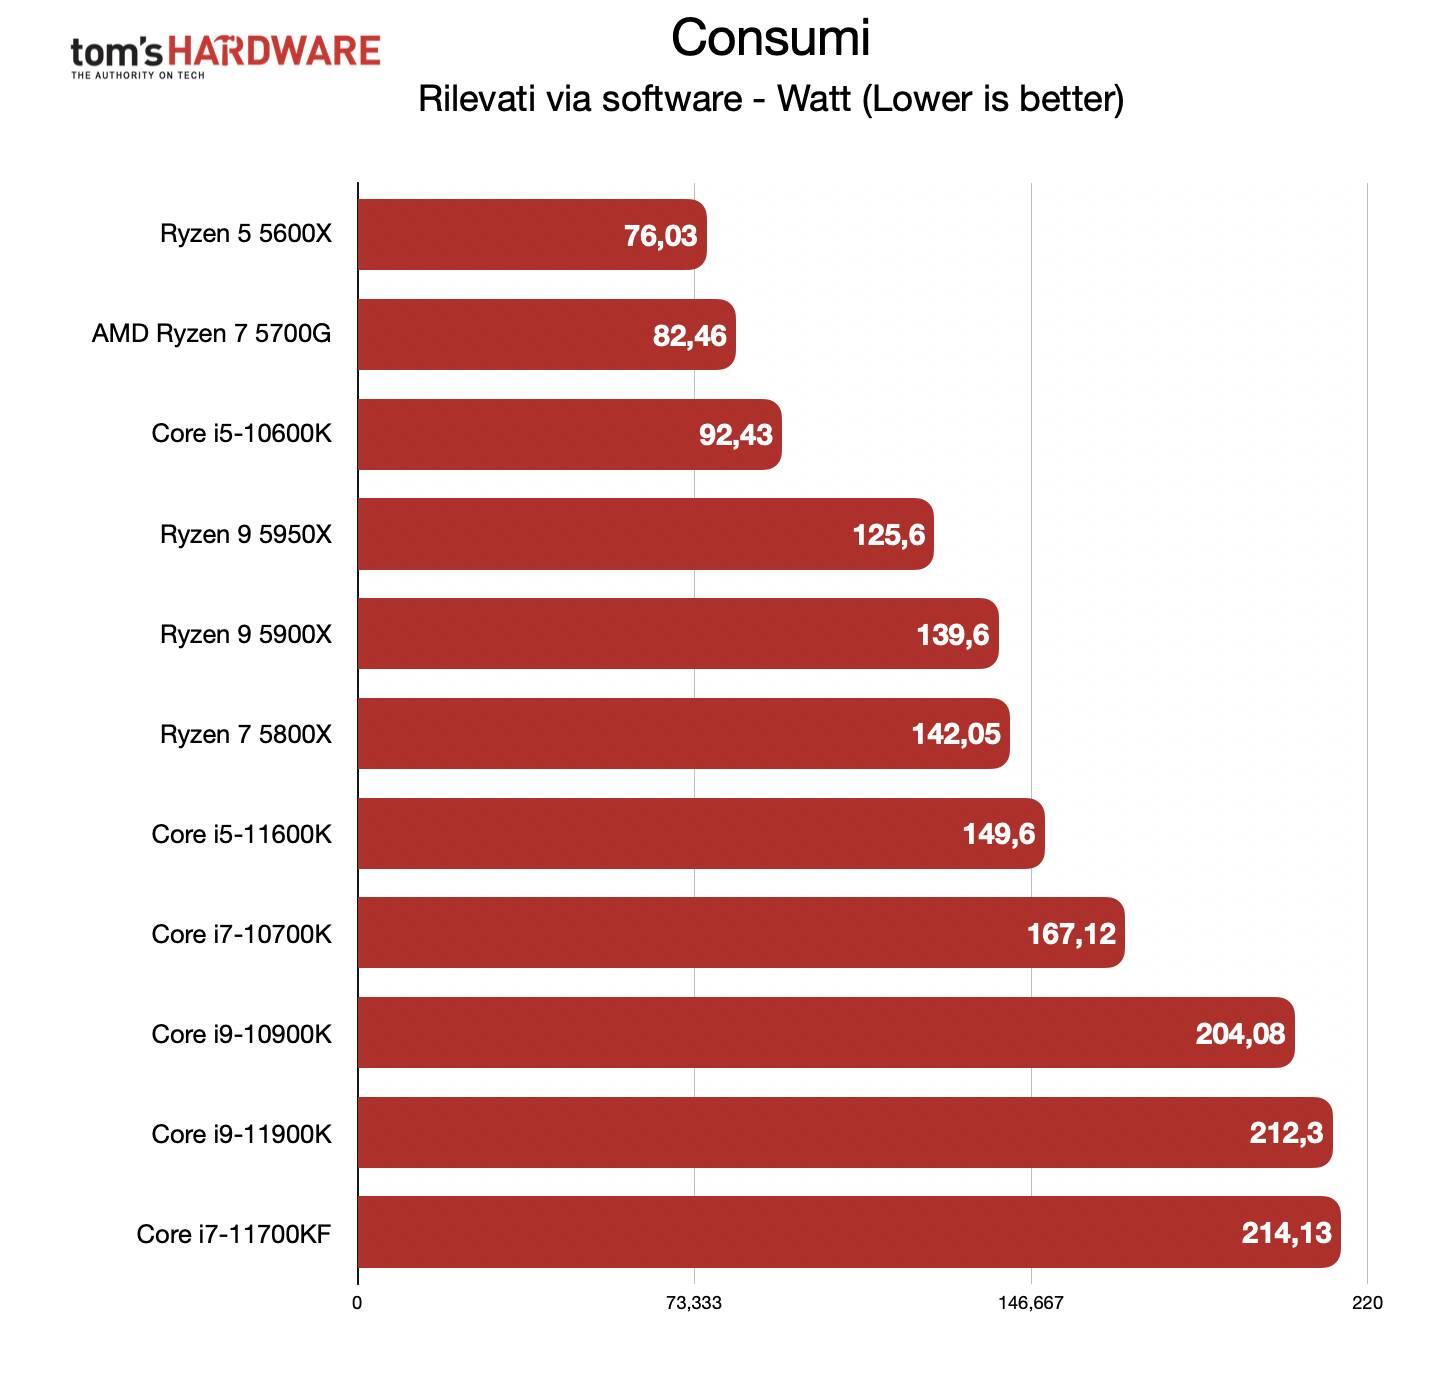 Benchmark Ryzen 7 5700G - Consumi